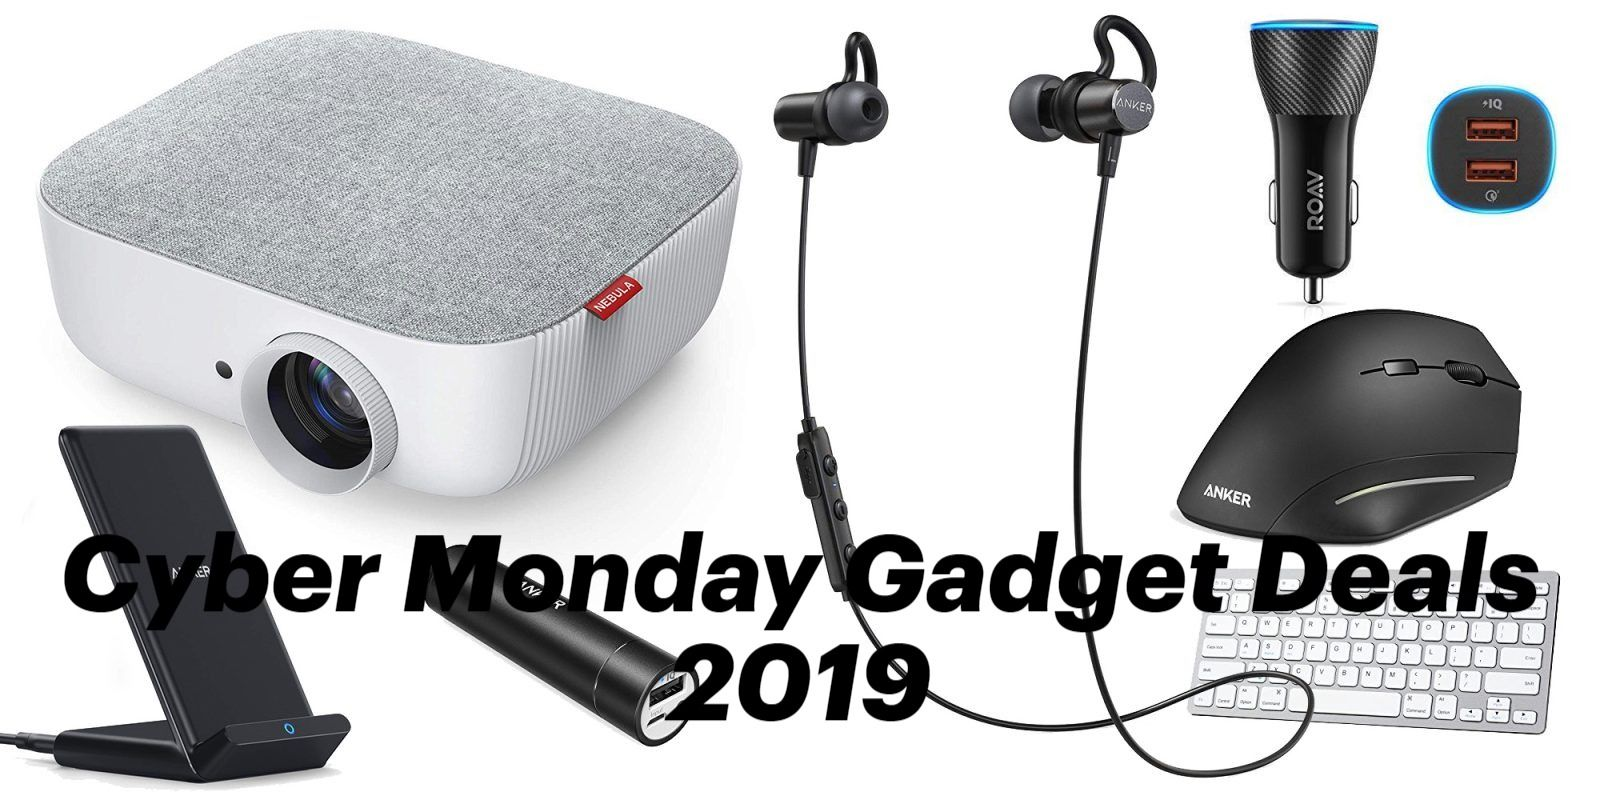 Cyber Monday Gadget Deals 2019 Black friday, Projector